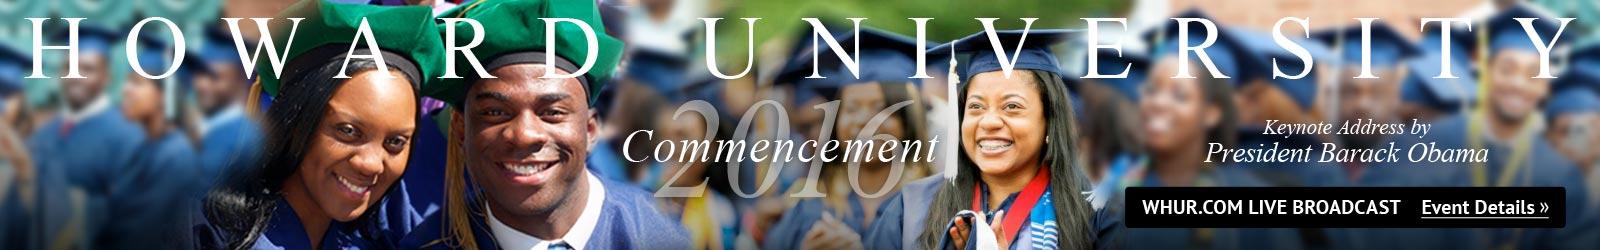 events_Howard-University-Commencement-2016